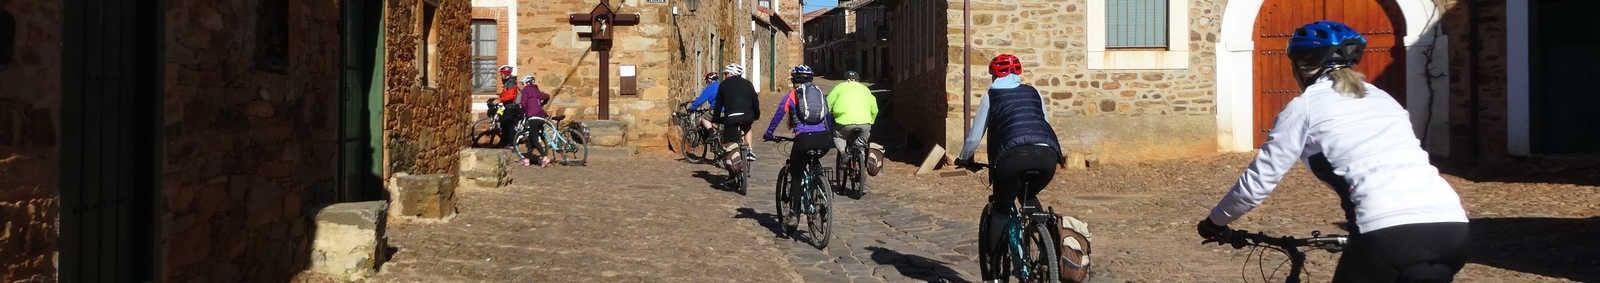 Cycling Camino de Santiago